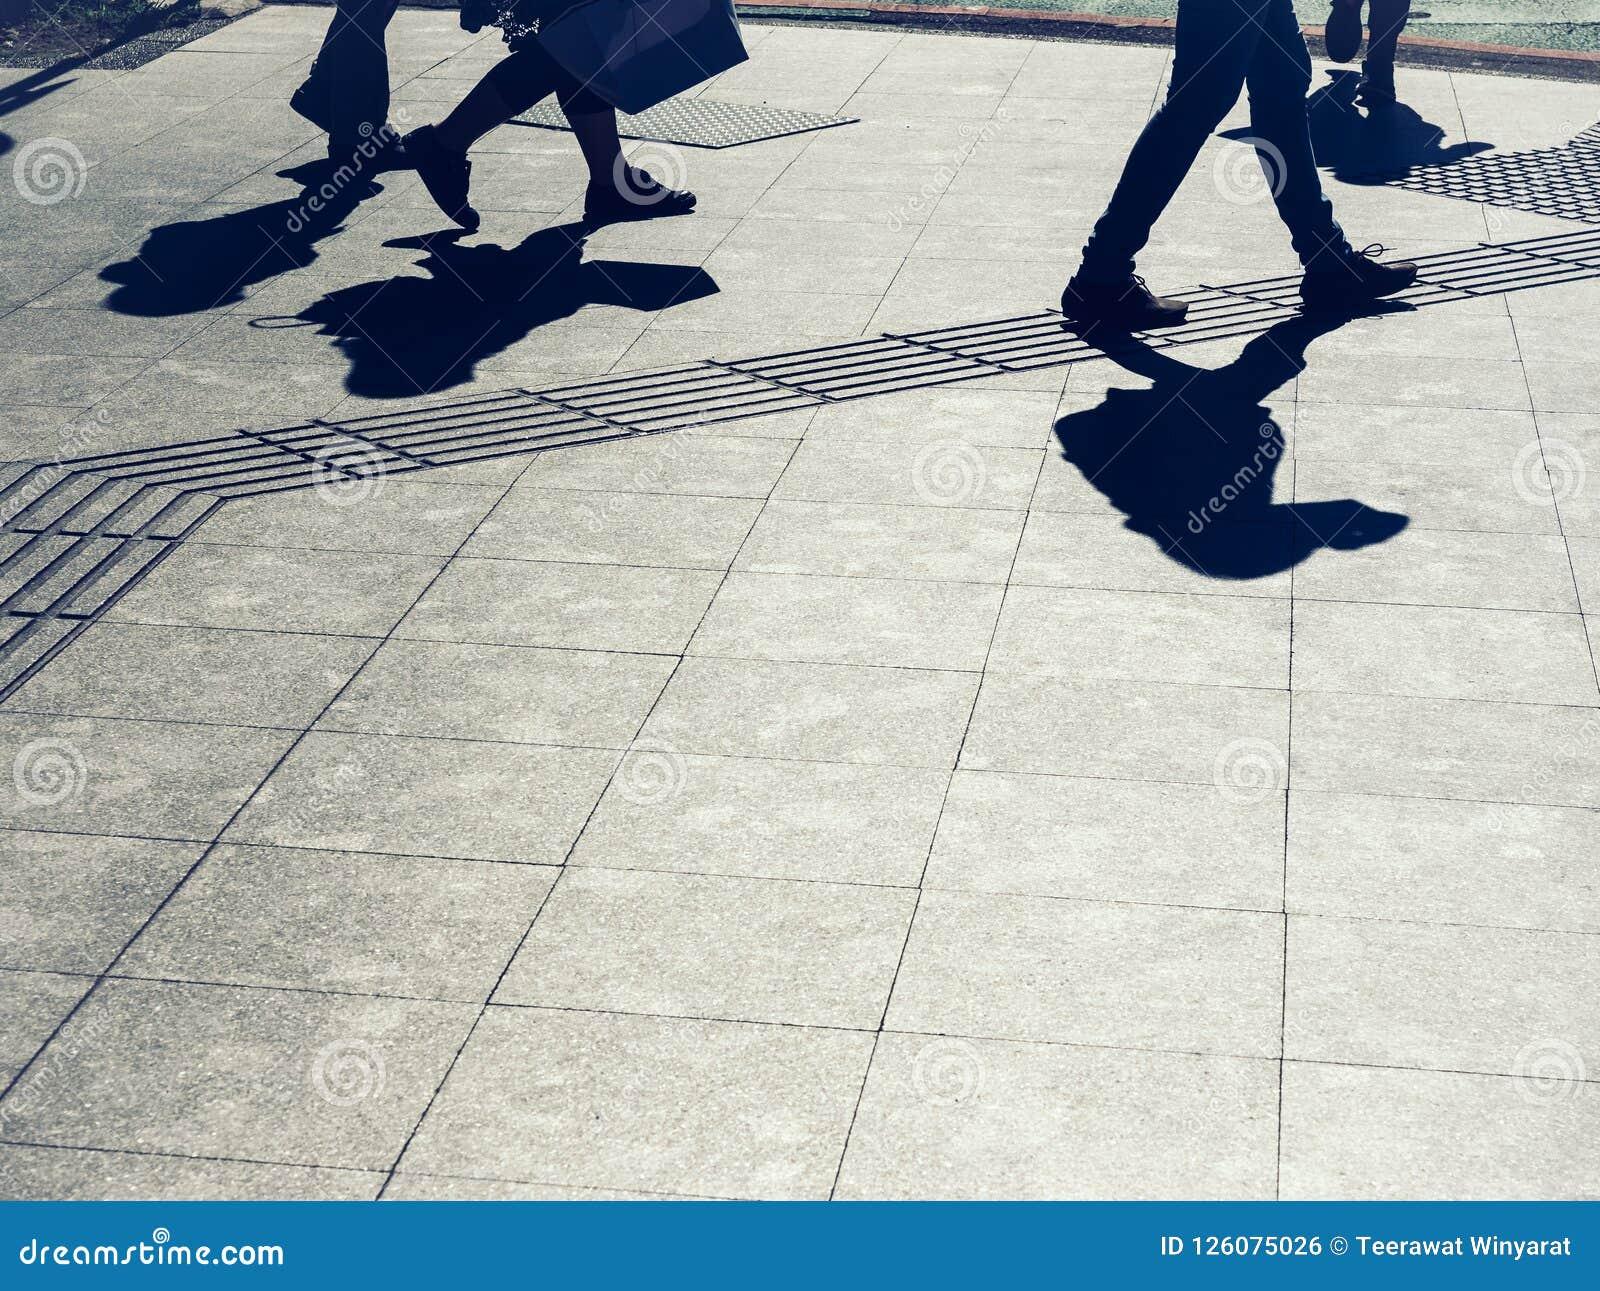 People walking on street Urban city lifestyle Background